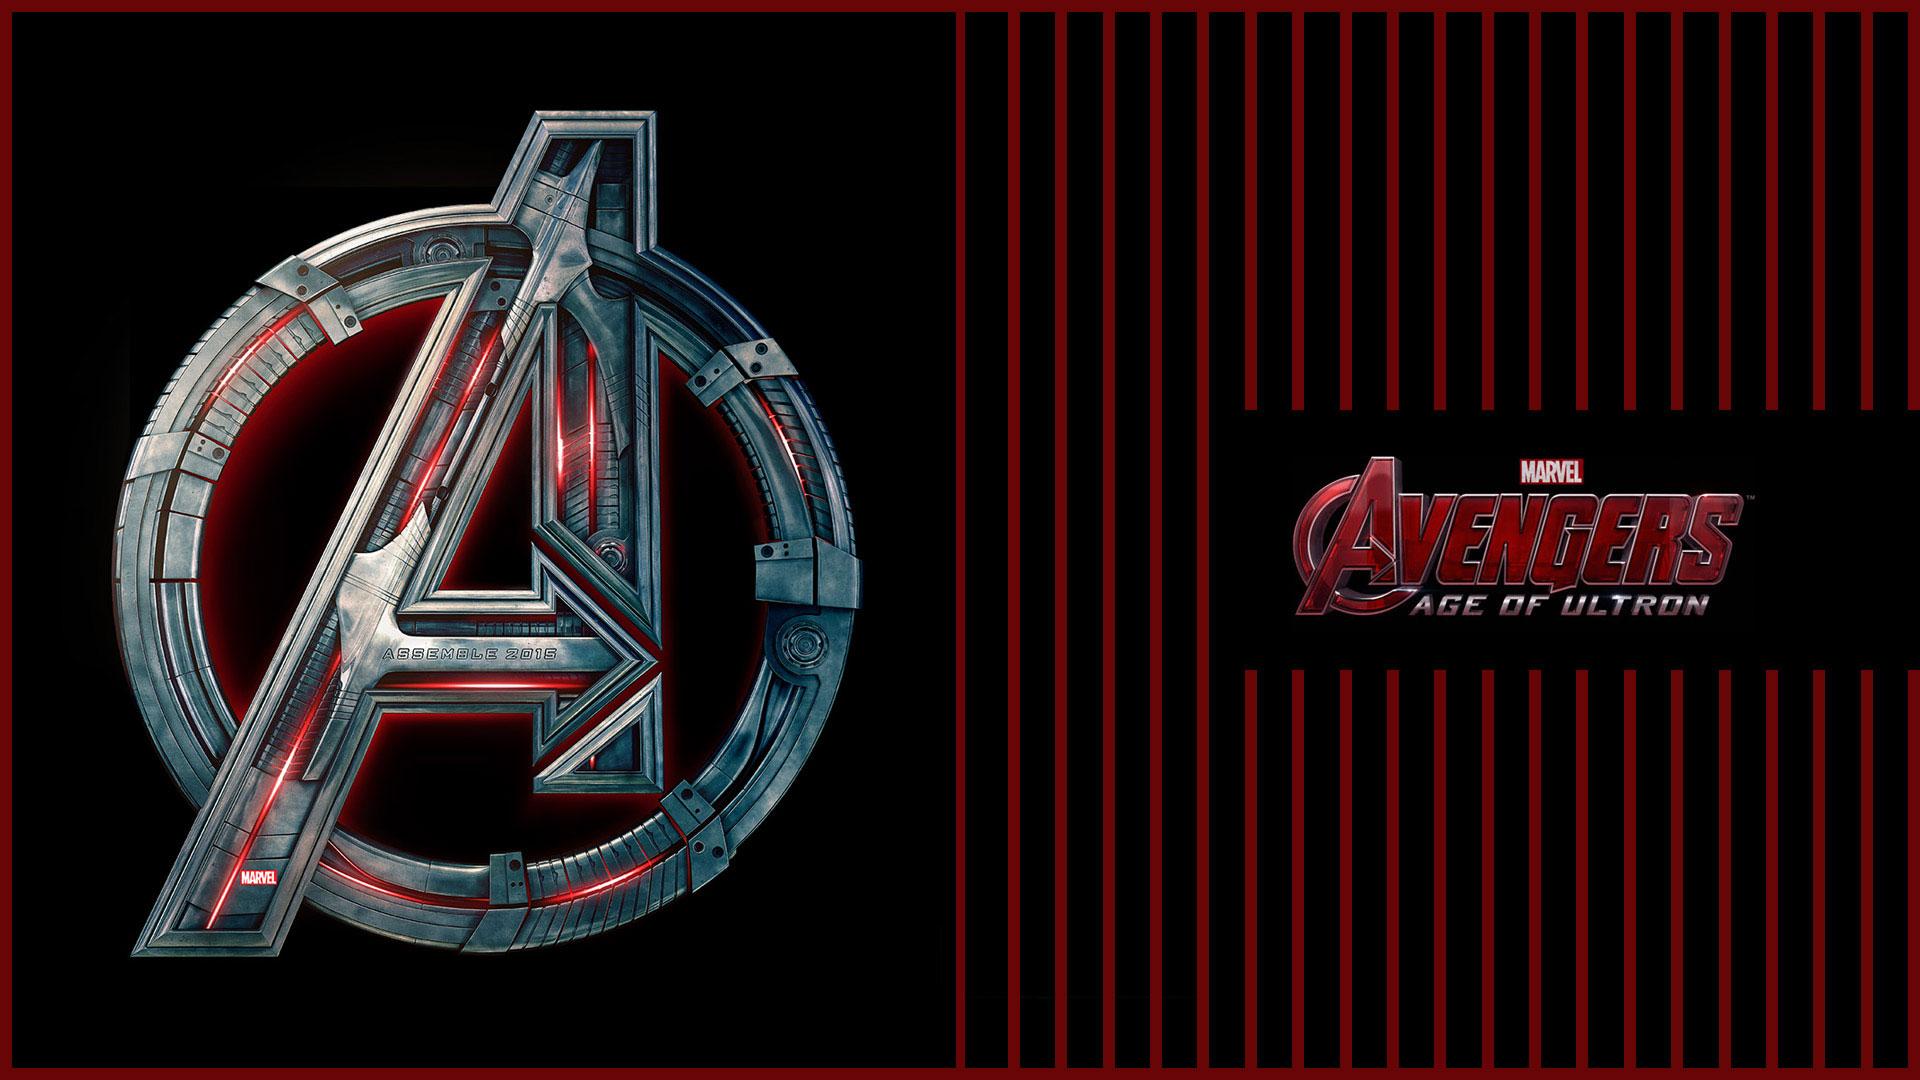 Hulk 3d Wallpaper Download Avengers 2 Age Of Ultron 2015 Desktop Amp Iphone Wallpapers Hd